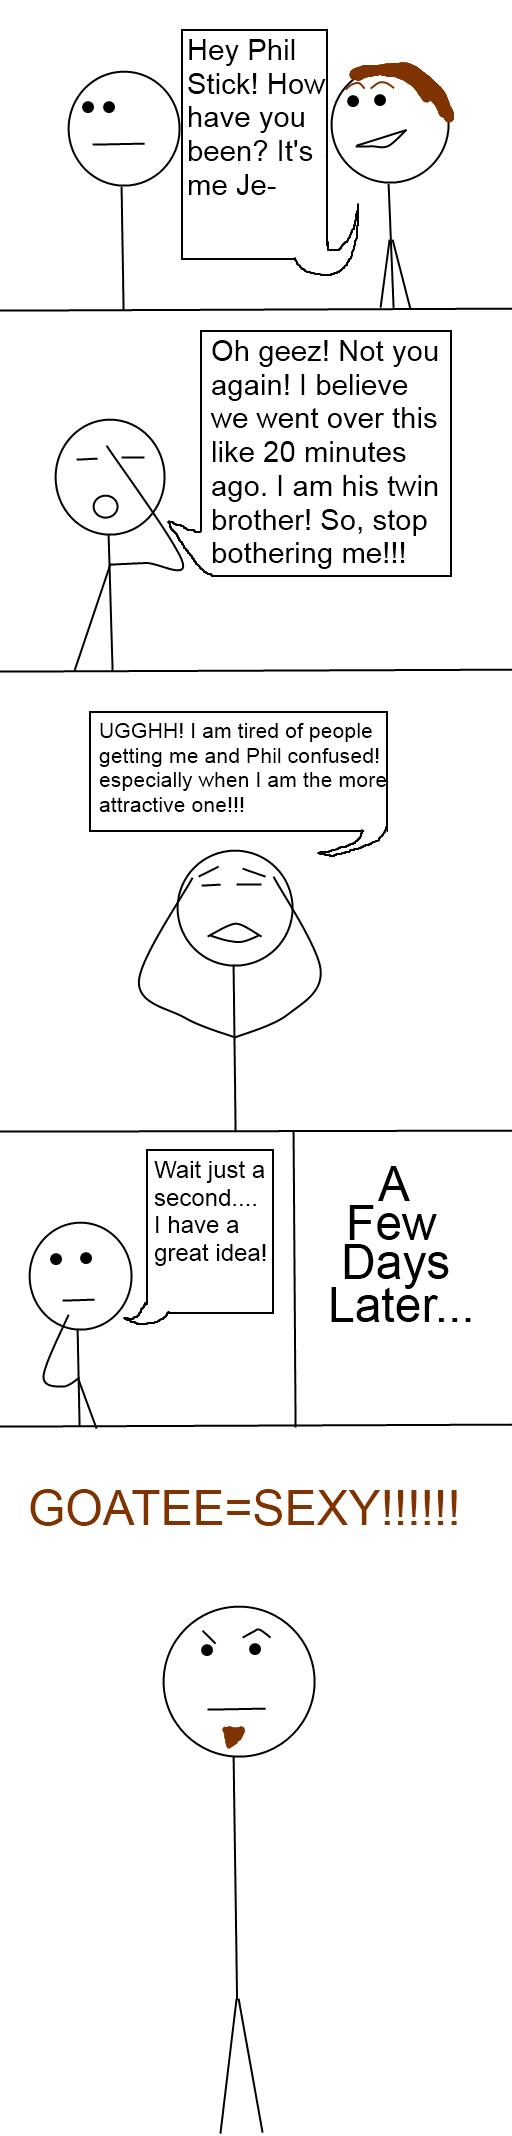 Confusion Part 2